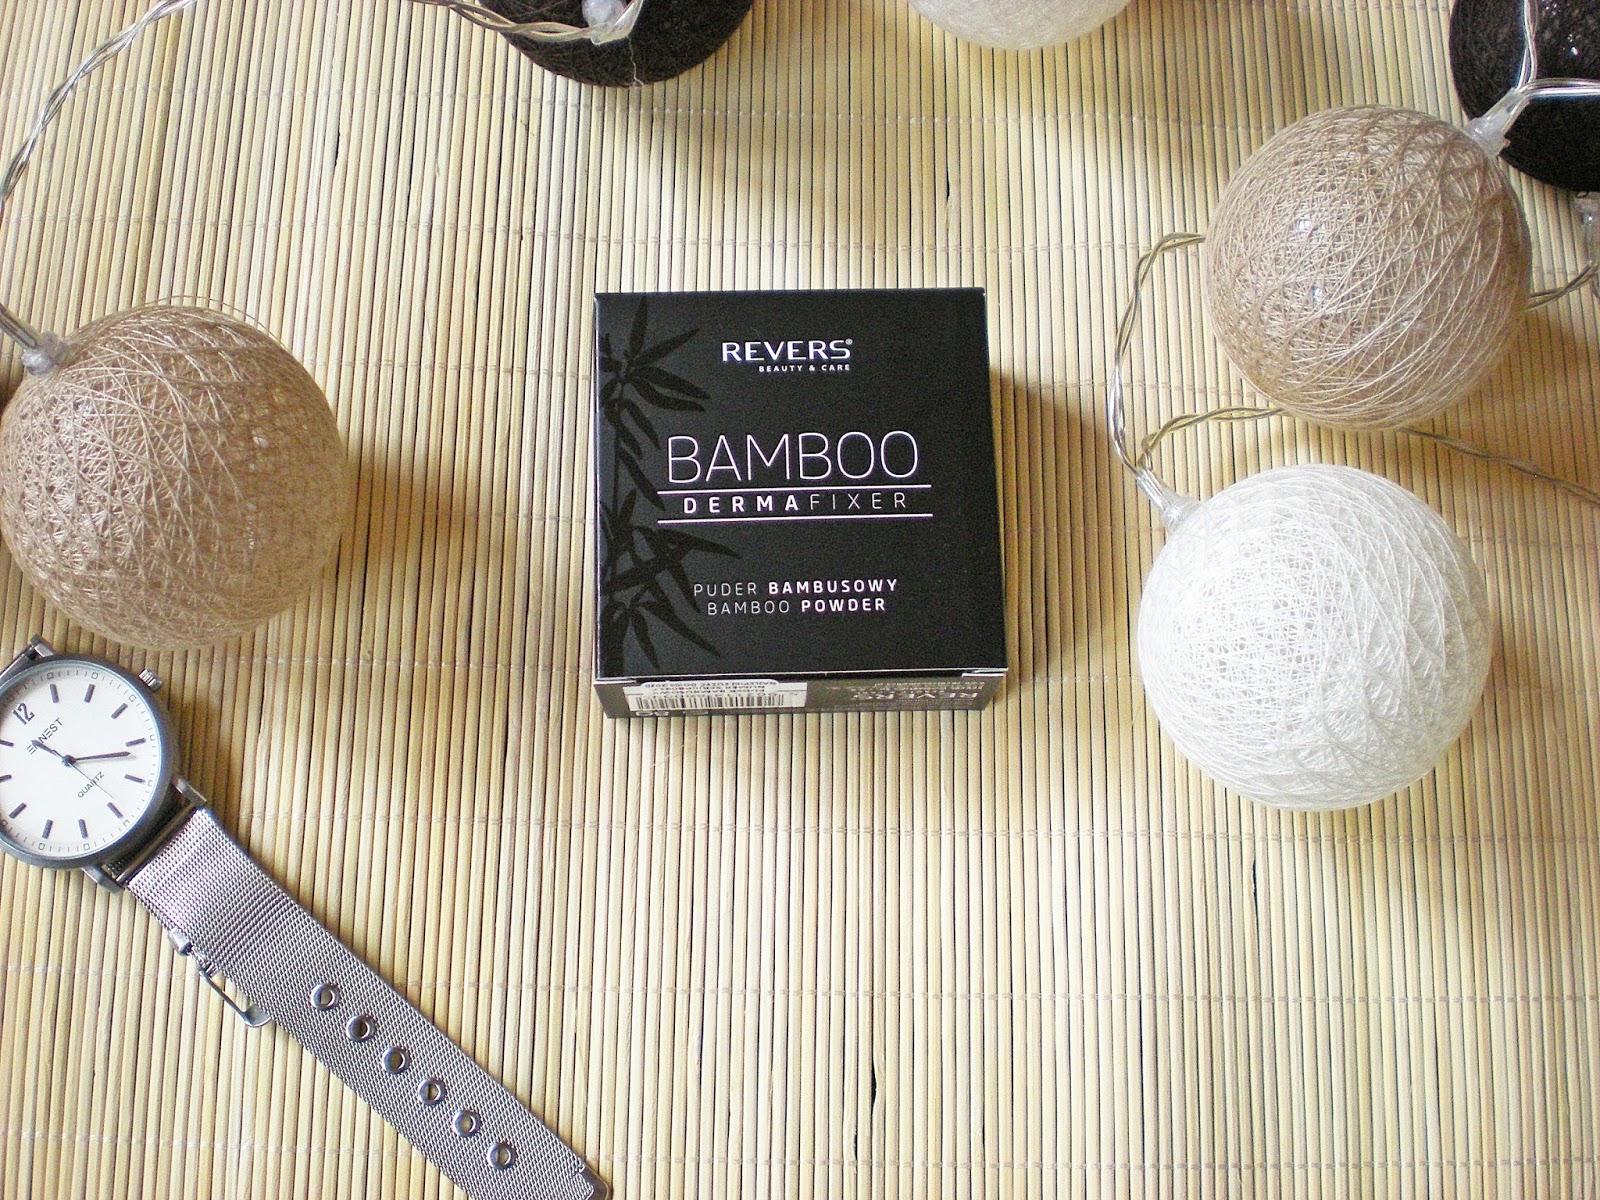 Puder bambusowy od Revers Cosmetics